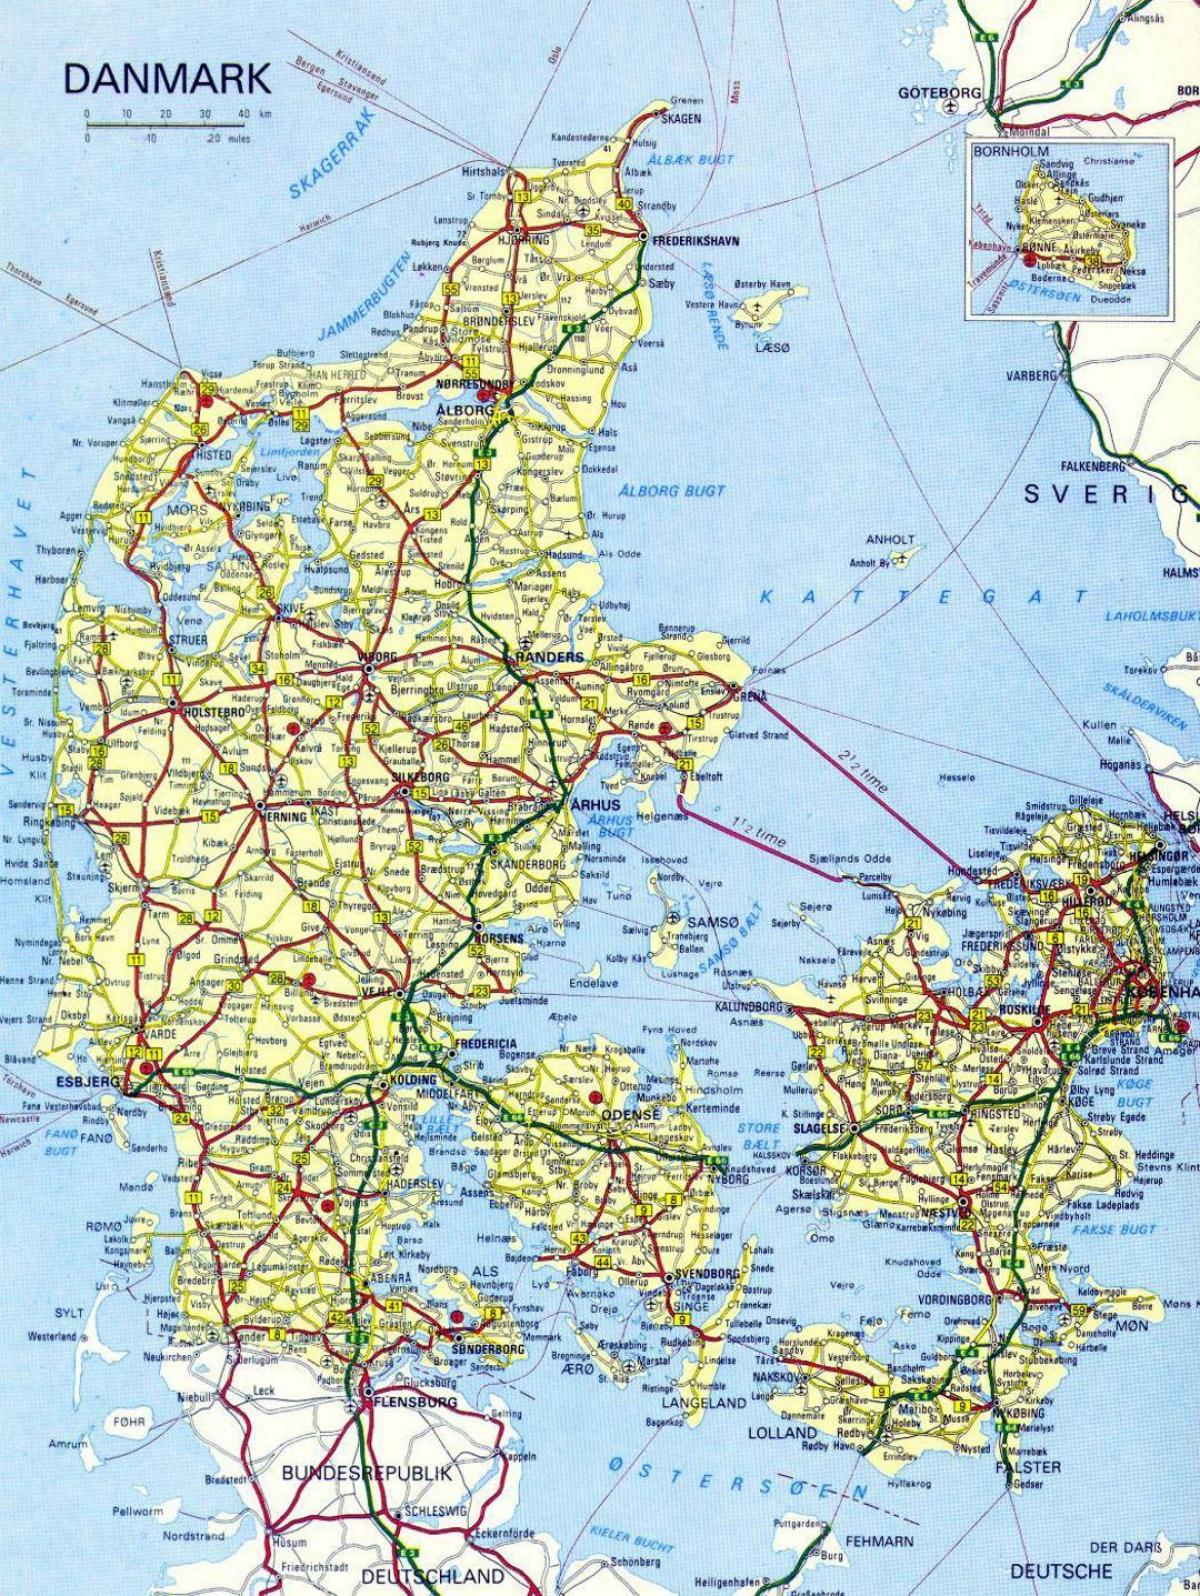 Tanska Kaupunkien Kartta Tanska Kartta Kaupungit Pohjois